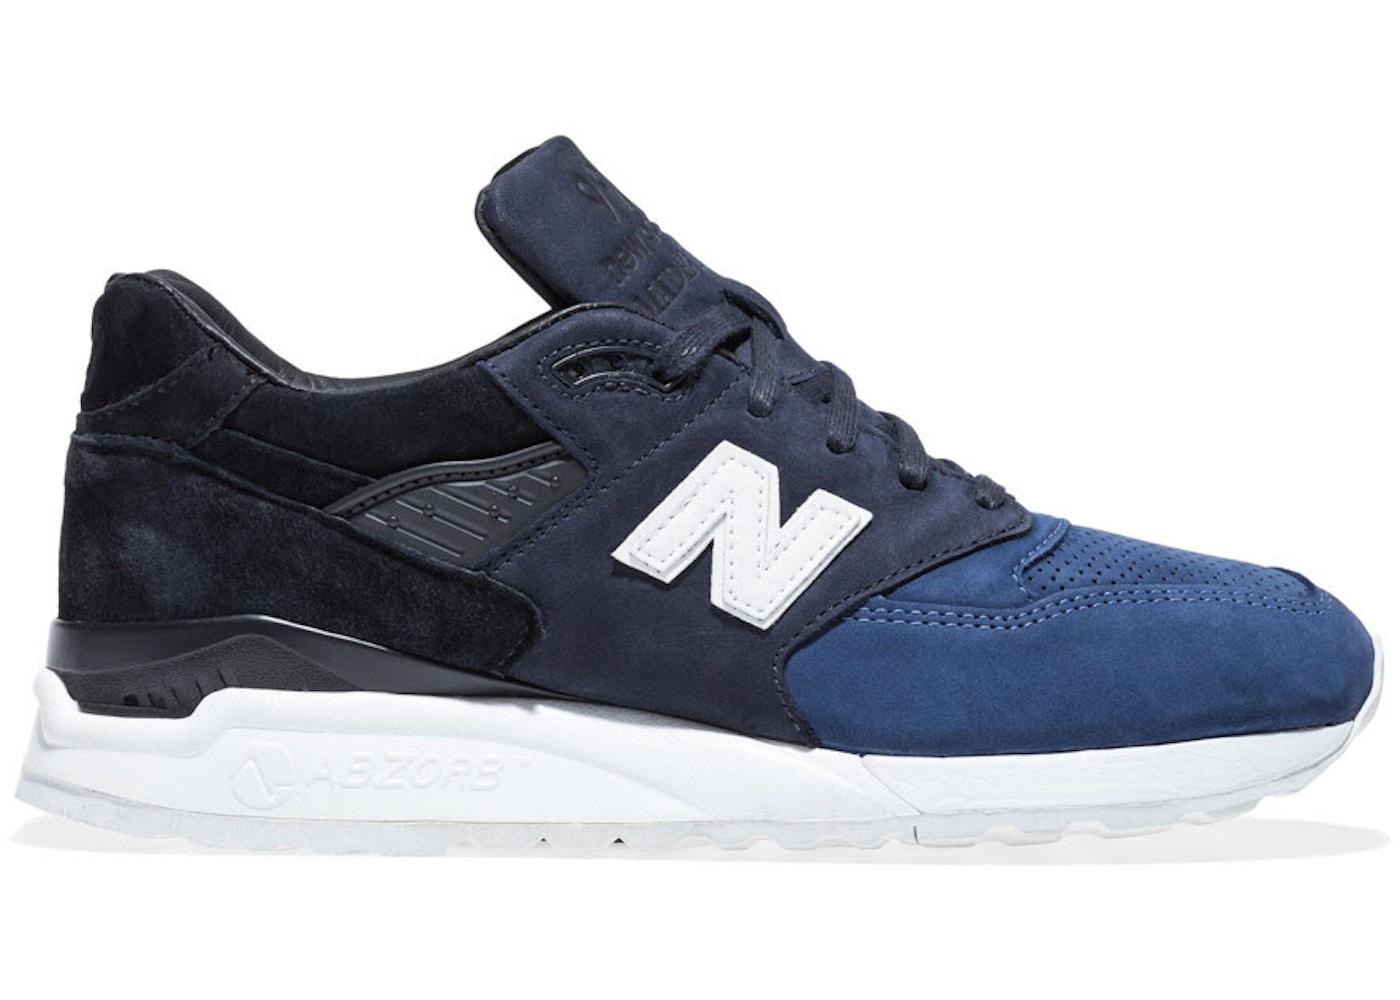 new style 82e97 eacc4 New Balance Size 6 Shoes - Last Sale